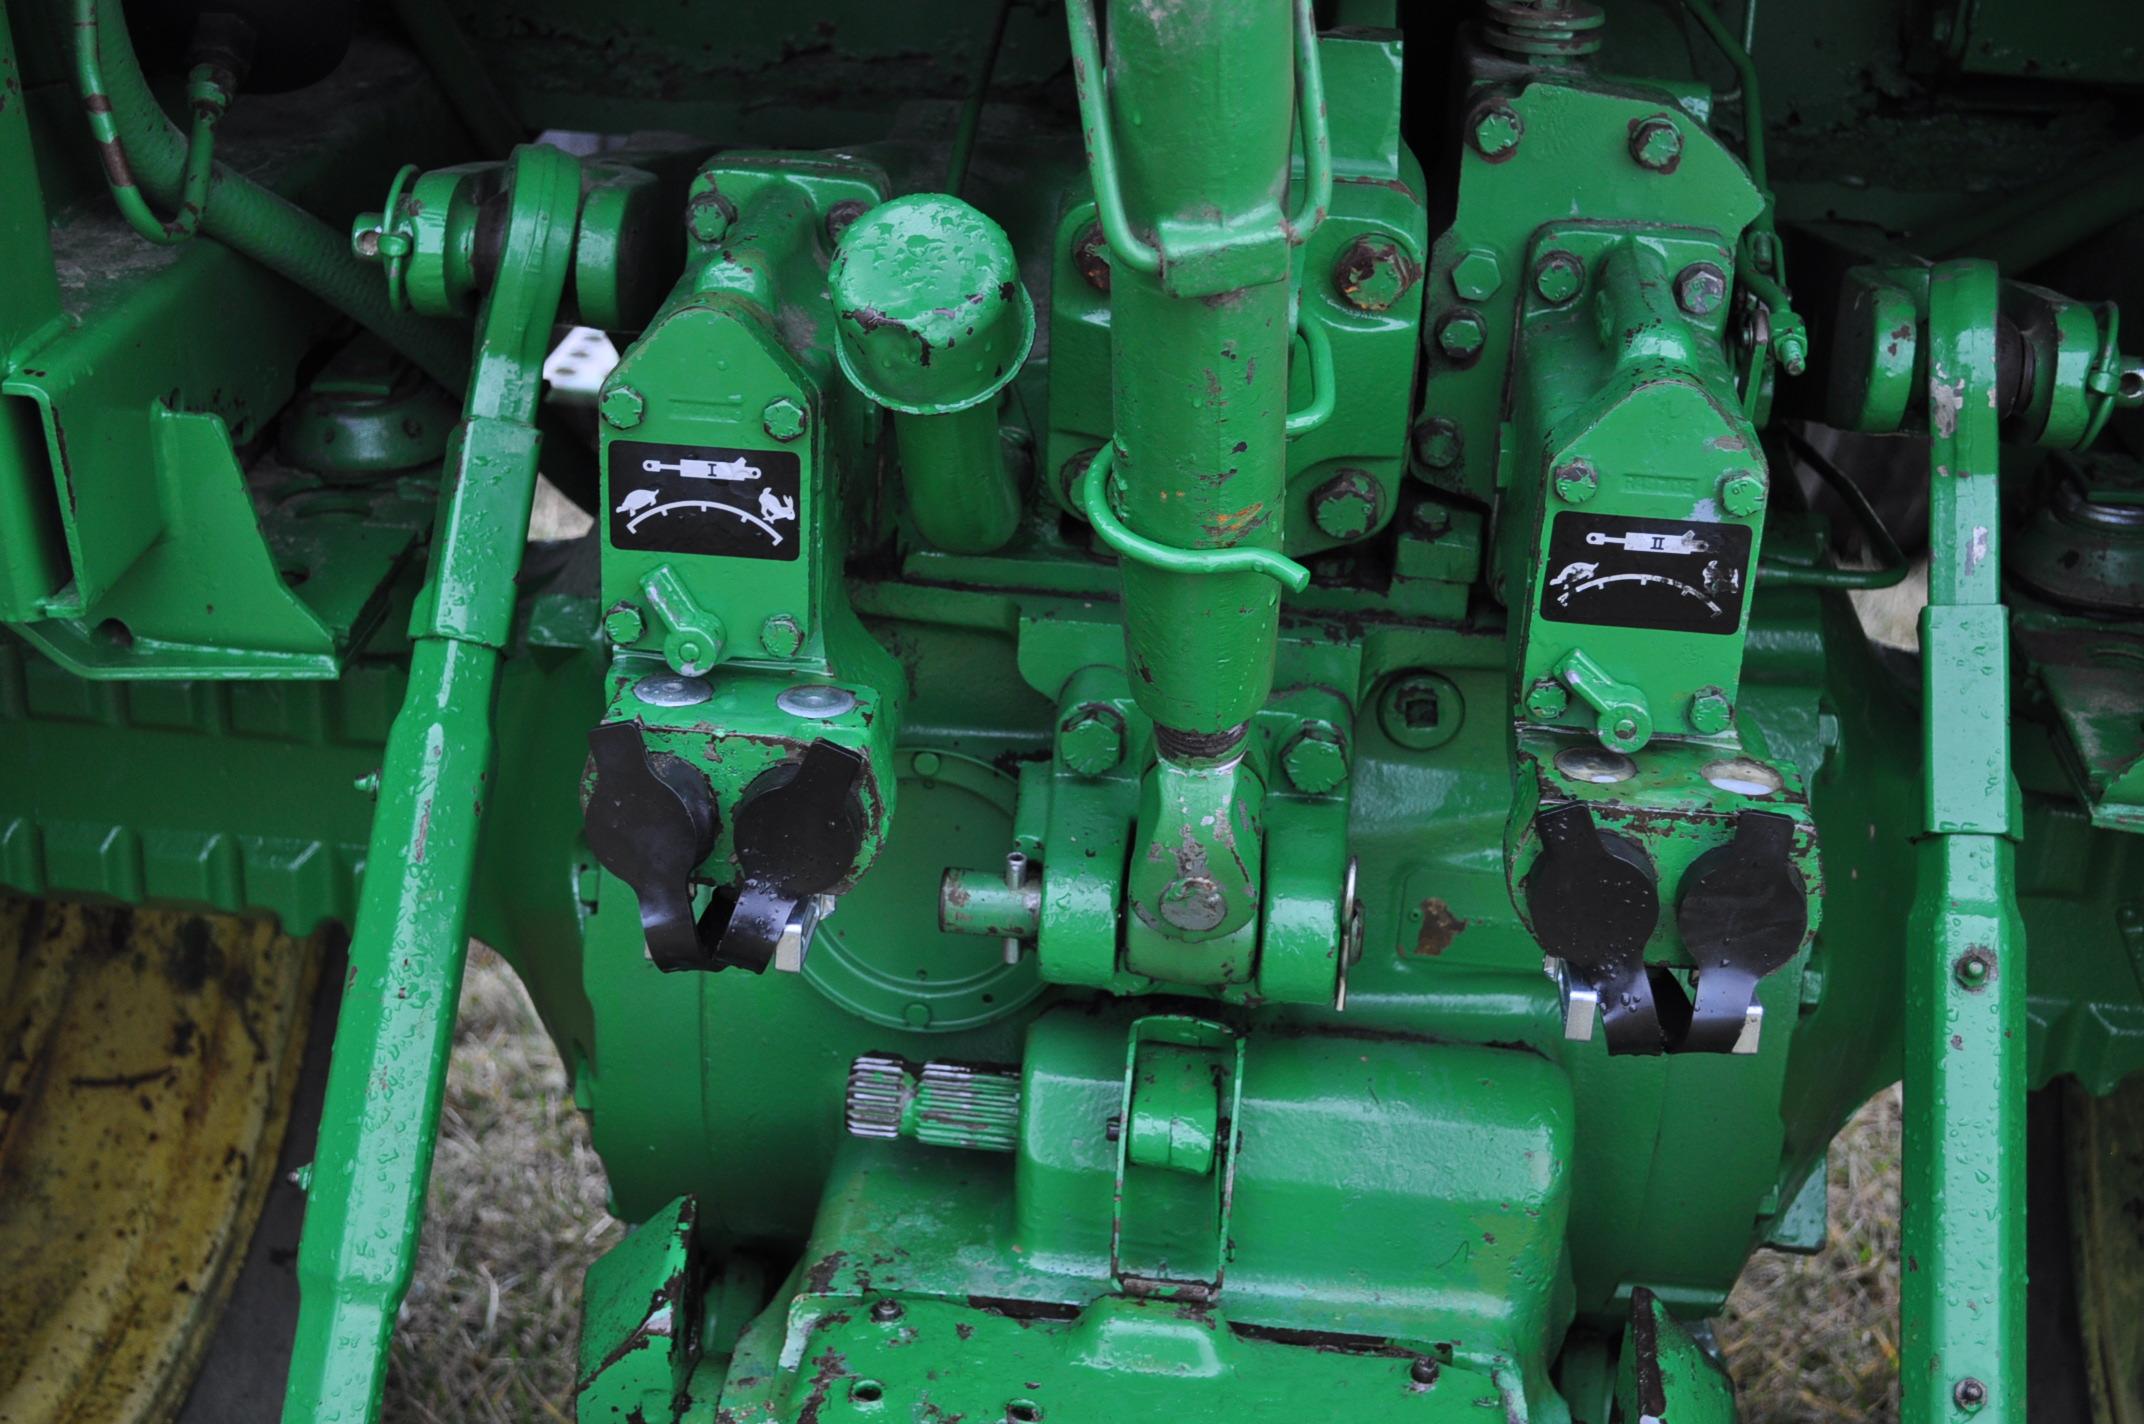 John Deere 4230 tractor, diesel, 18.4-34 hub duals, 10.00-16 front, CHA, Quad range, 2 hyd - Image 15 of 23